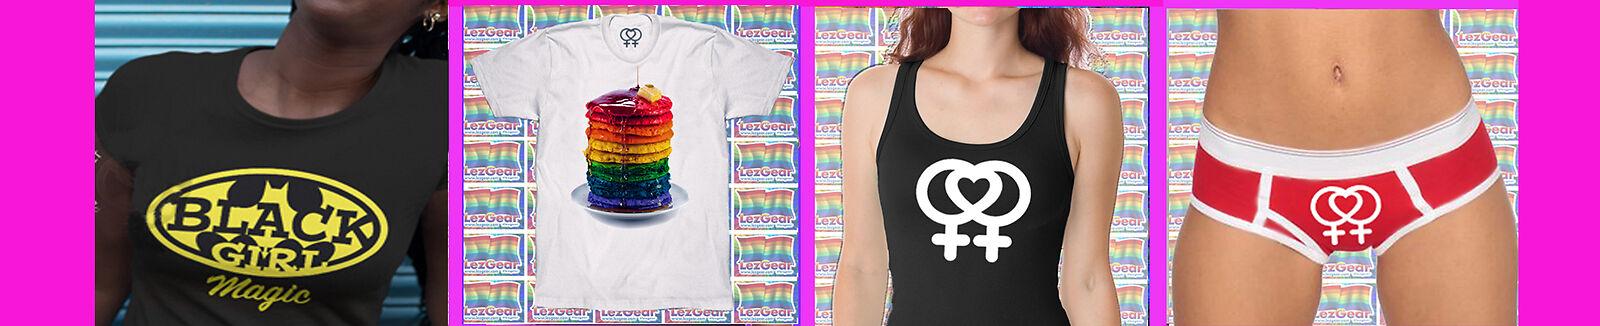 GIRLPRIDESTORE Lesbian Parody Gear